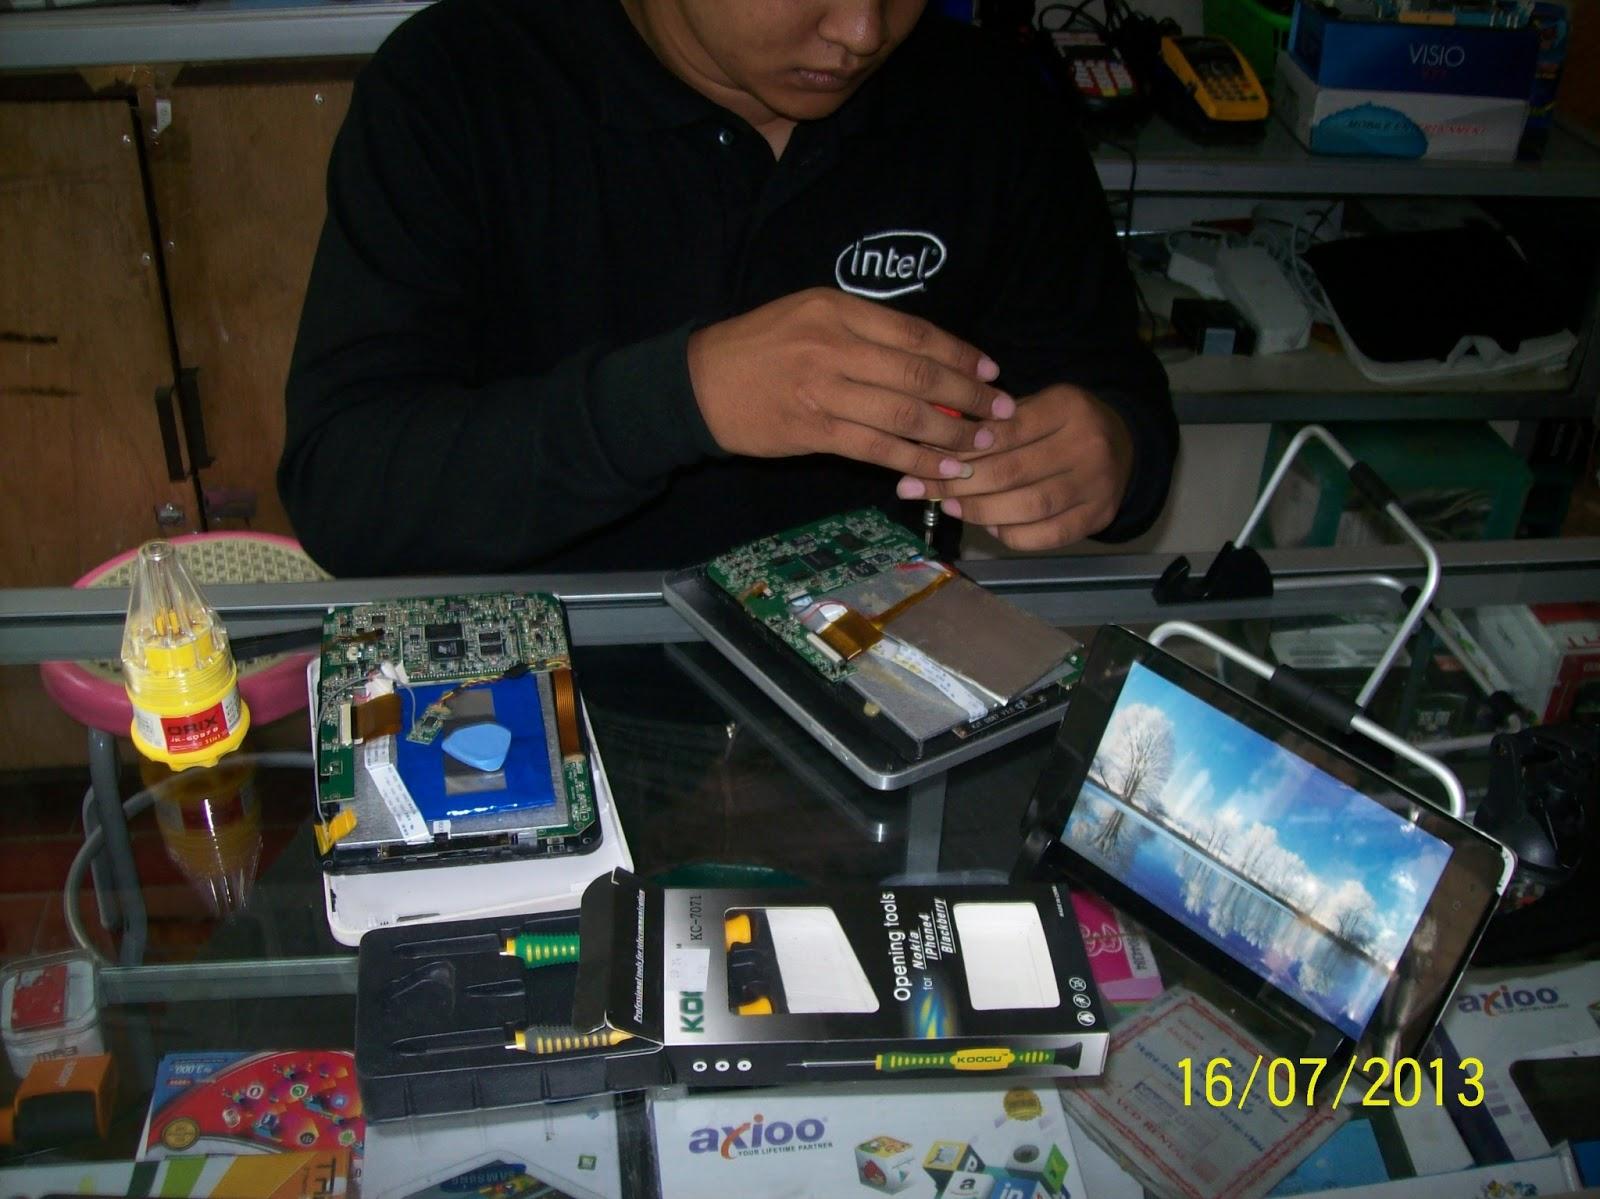 Pusat Servis dan Perbaikan Tablet PC Terpercaya di Jogja segera hadir